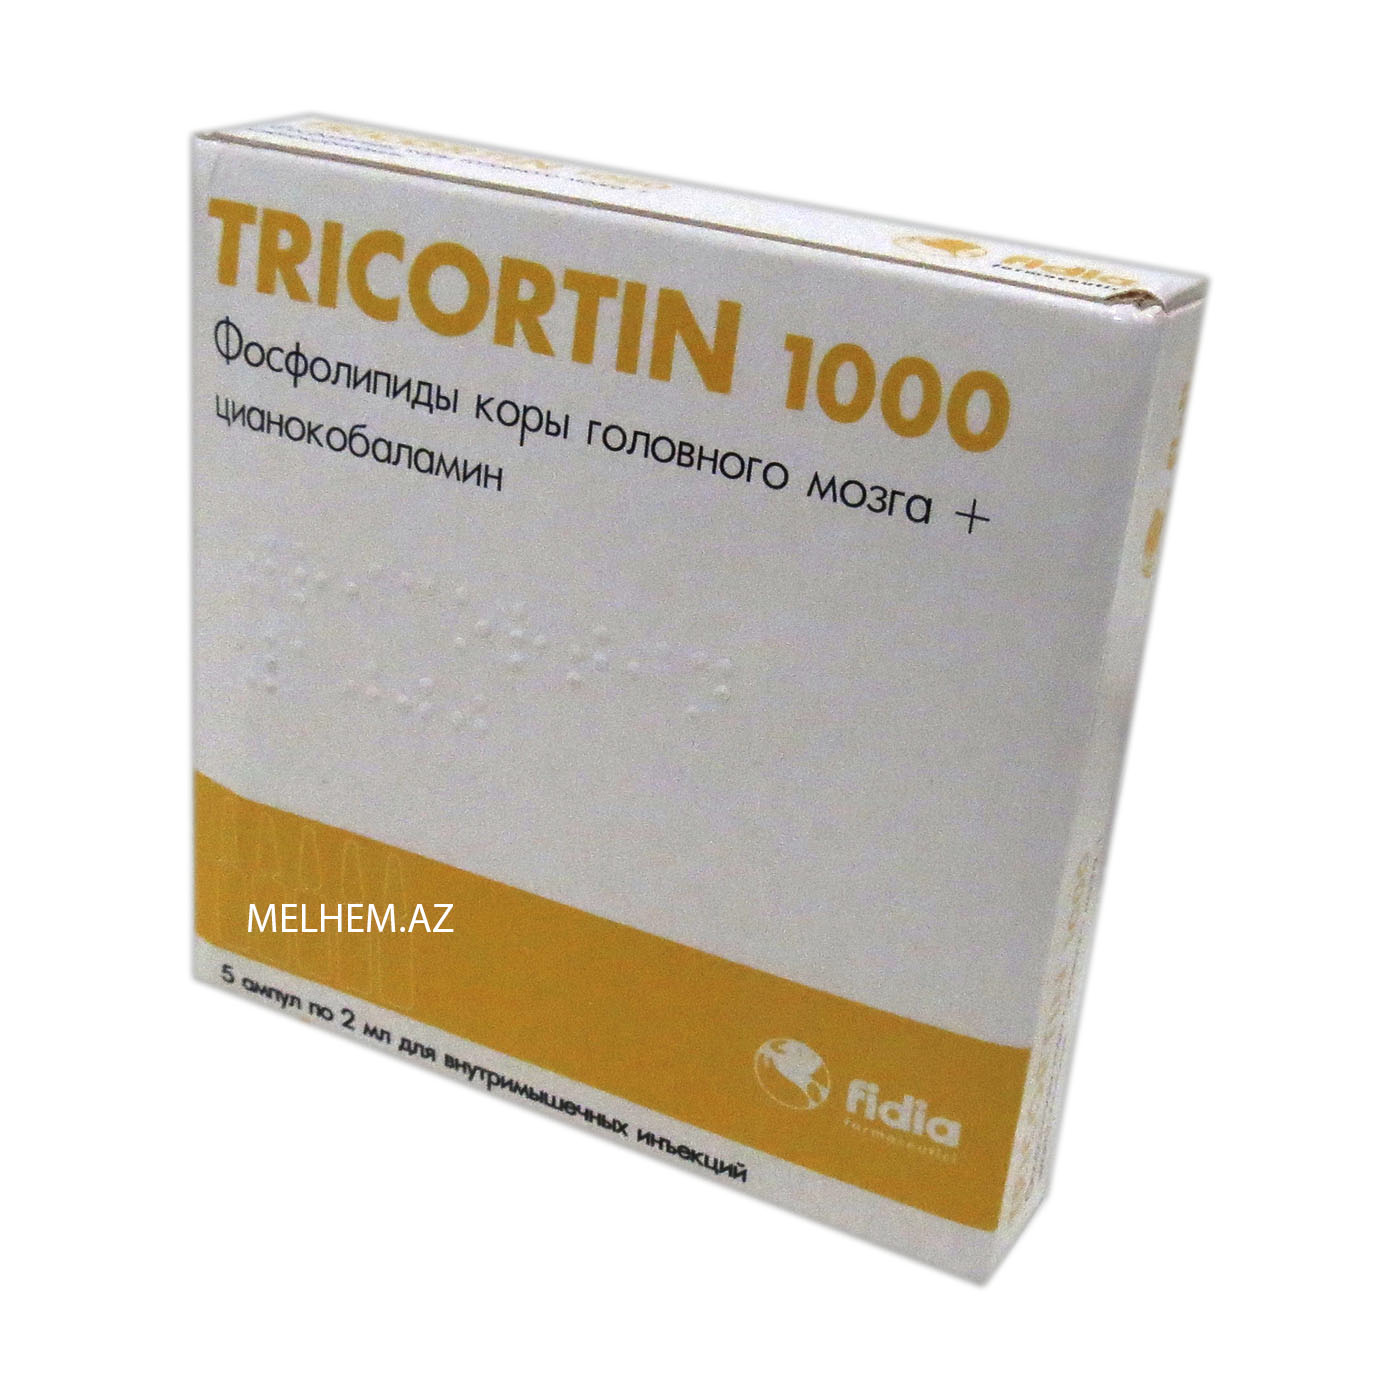 TRICORTIN 1000